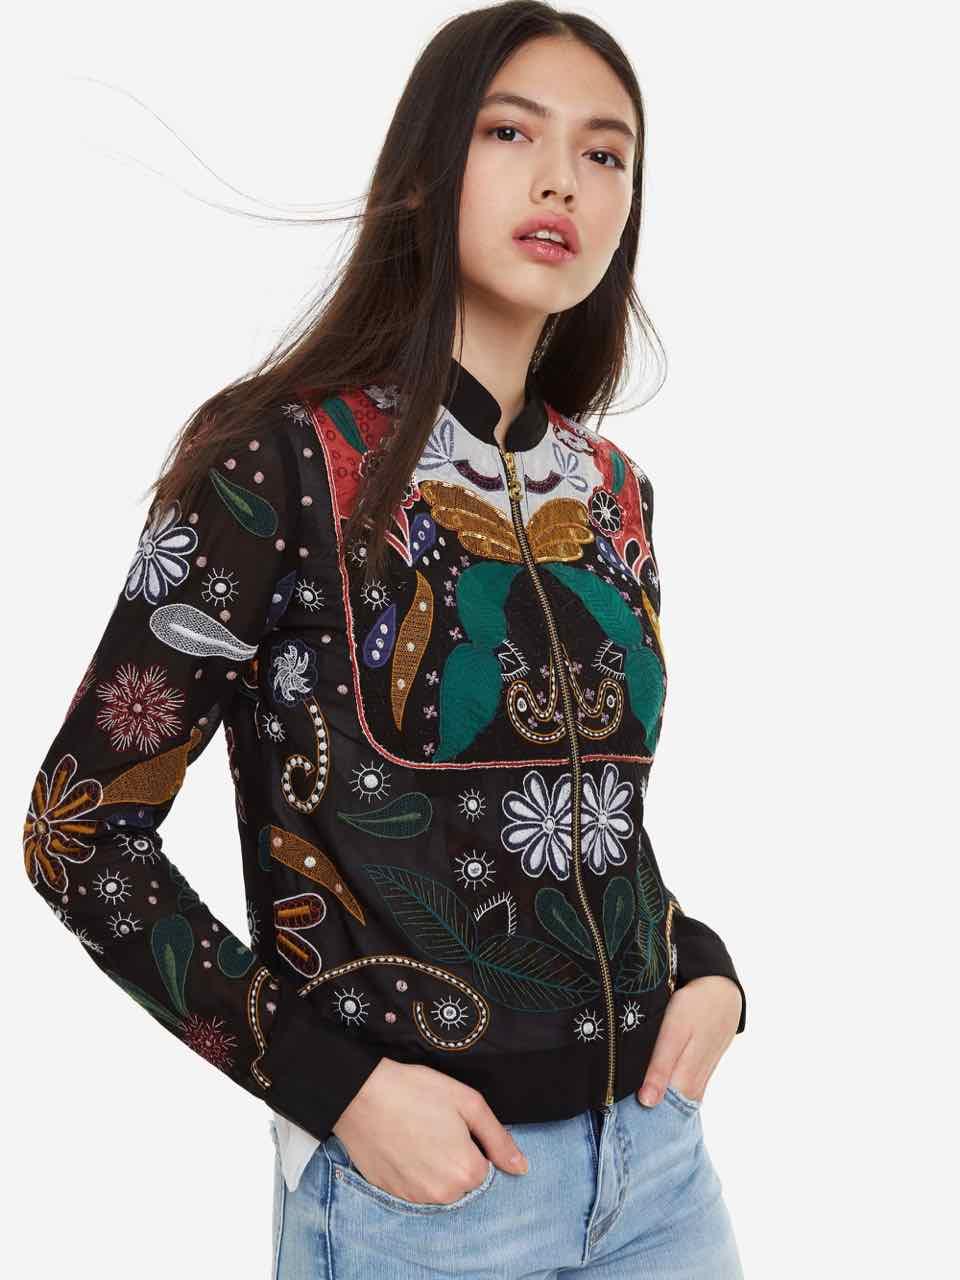 dfc2cf2e2f8 DESIGUAL Jacket Paisley KARIN Embroidery 19SWEW55 Summer 2019